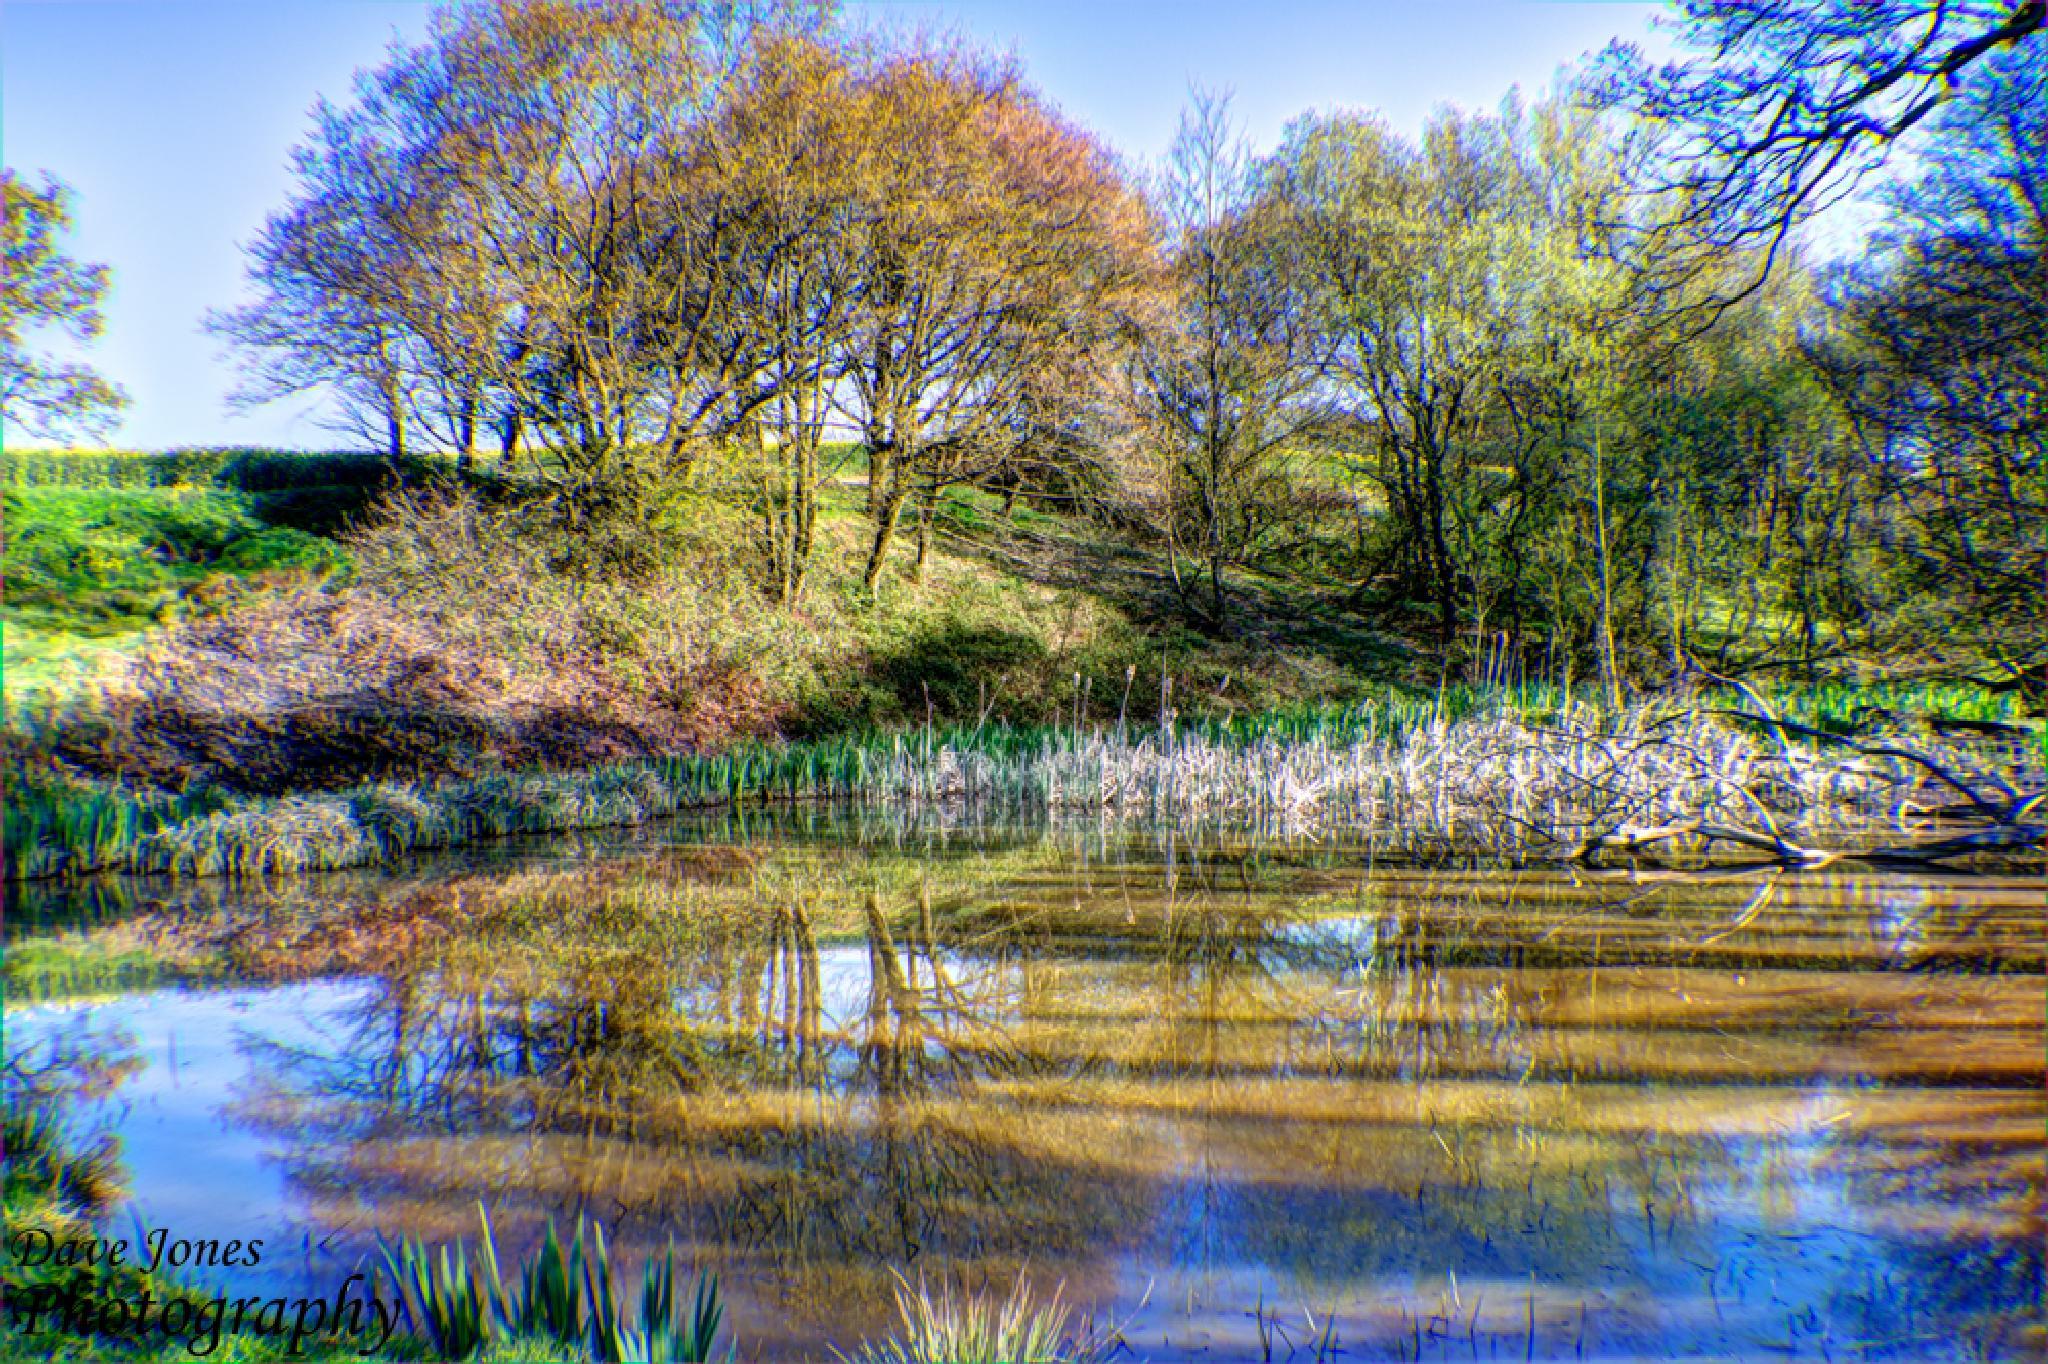 Pond HDR by DaveJonesPhotography